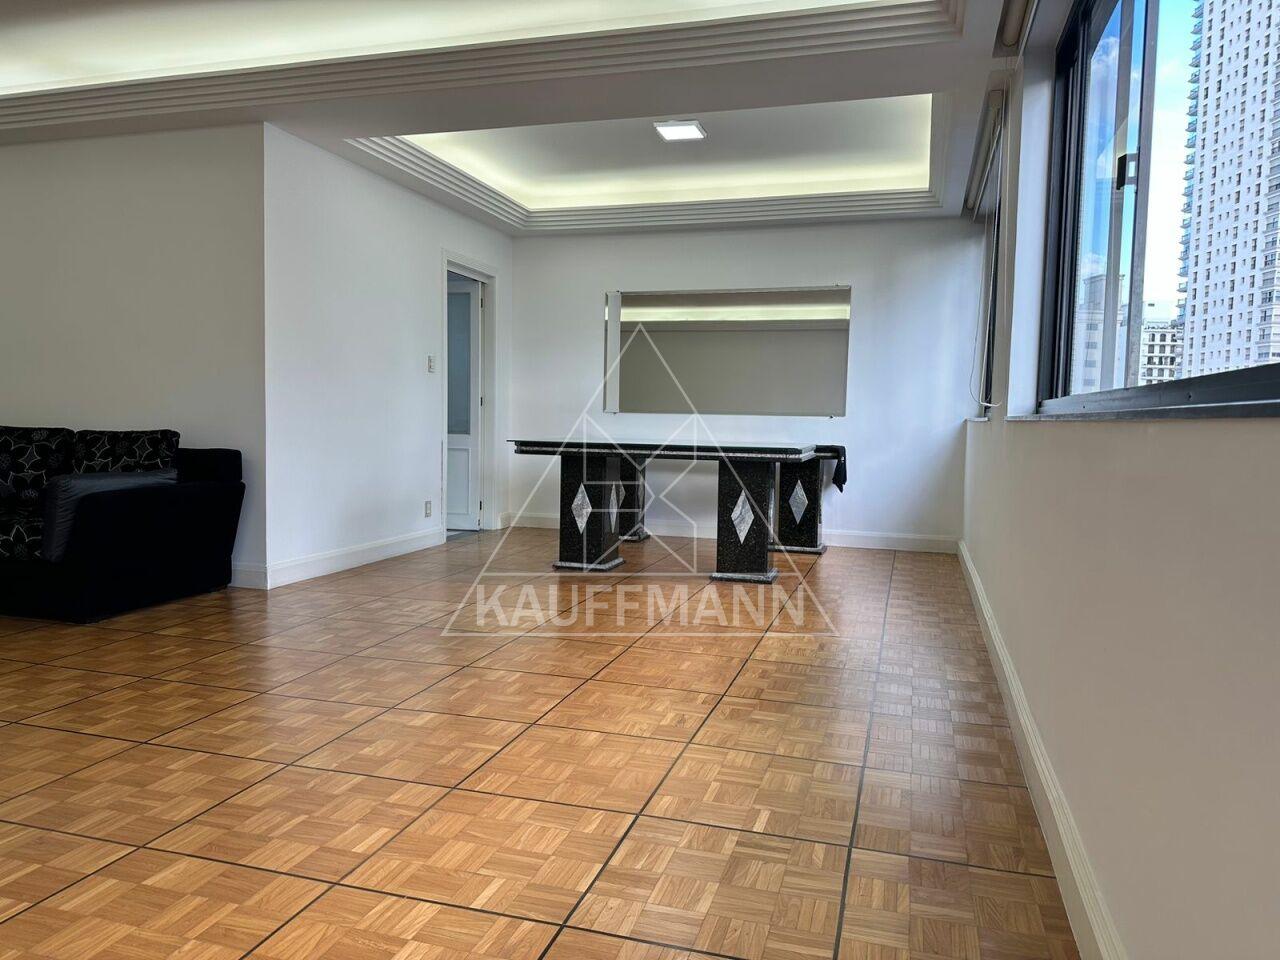 apartamento-venda-sao-paulo-higienopolis-inaja-3dormitorios-1suite-1vaga-212m2-Foto5